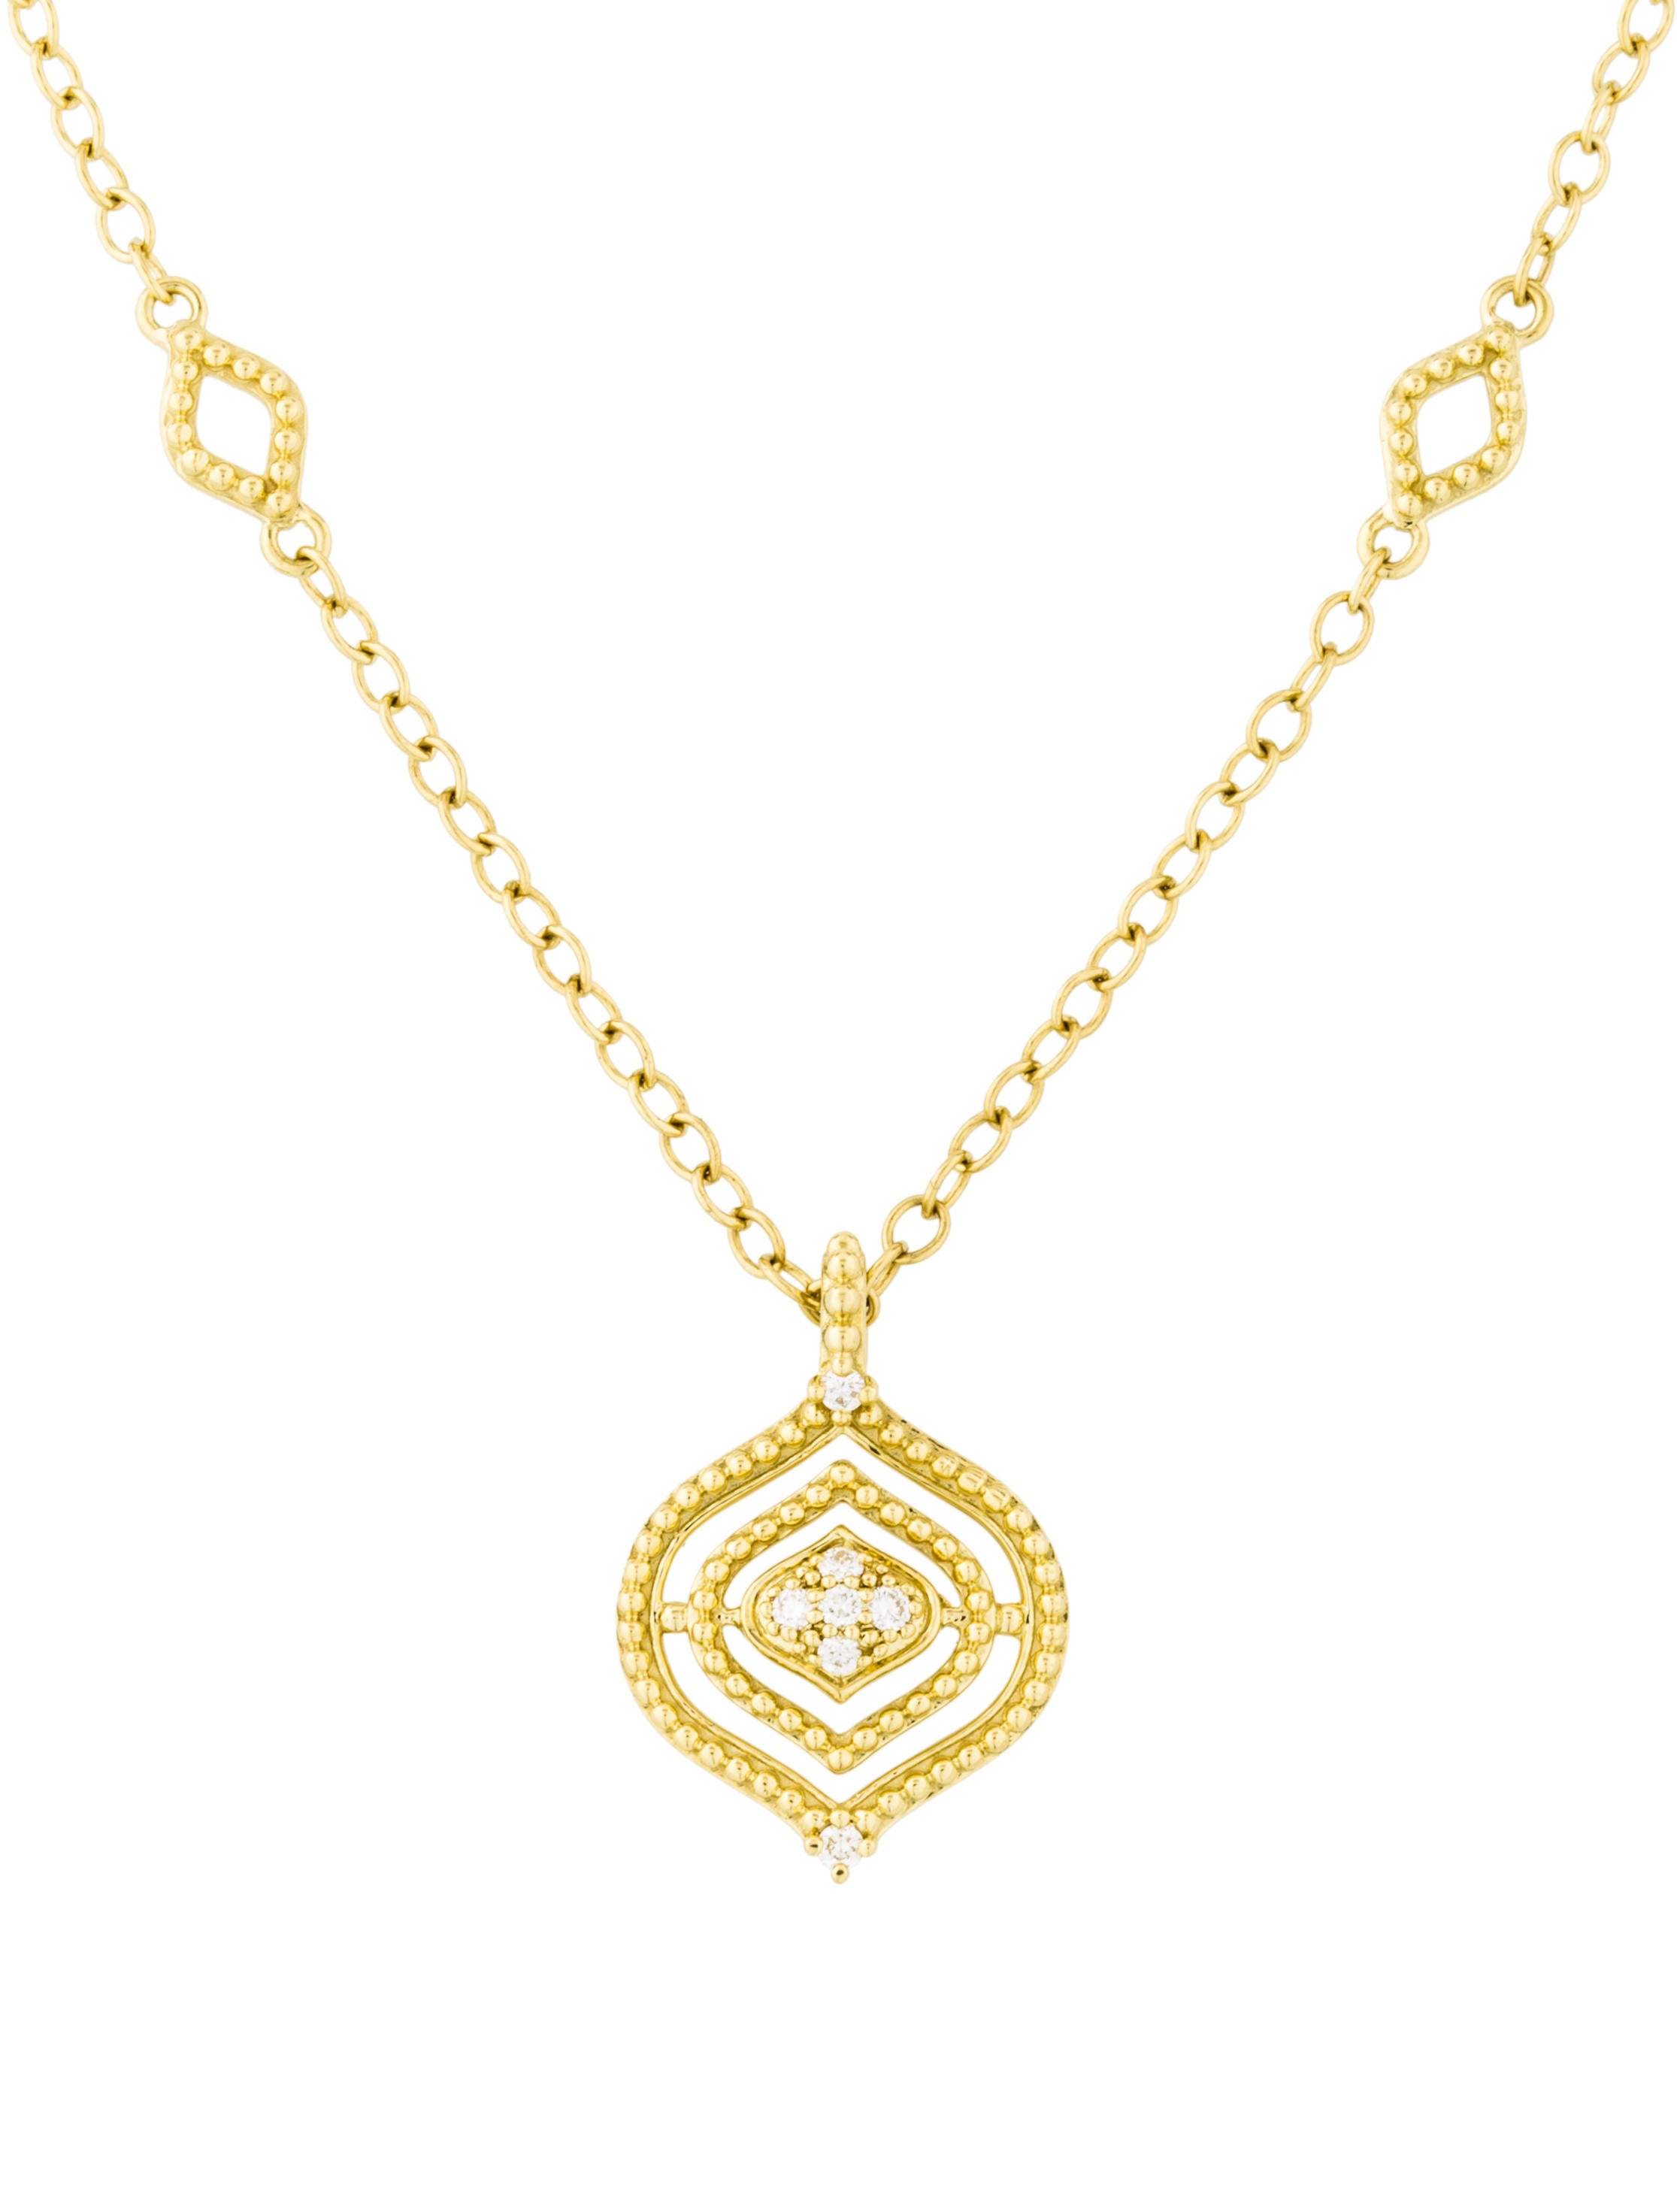 judith ripka 18k stella small diamond pendant necklace. Black Bedroom Furniture Sets. Home Design Ideas